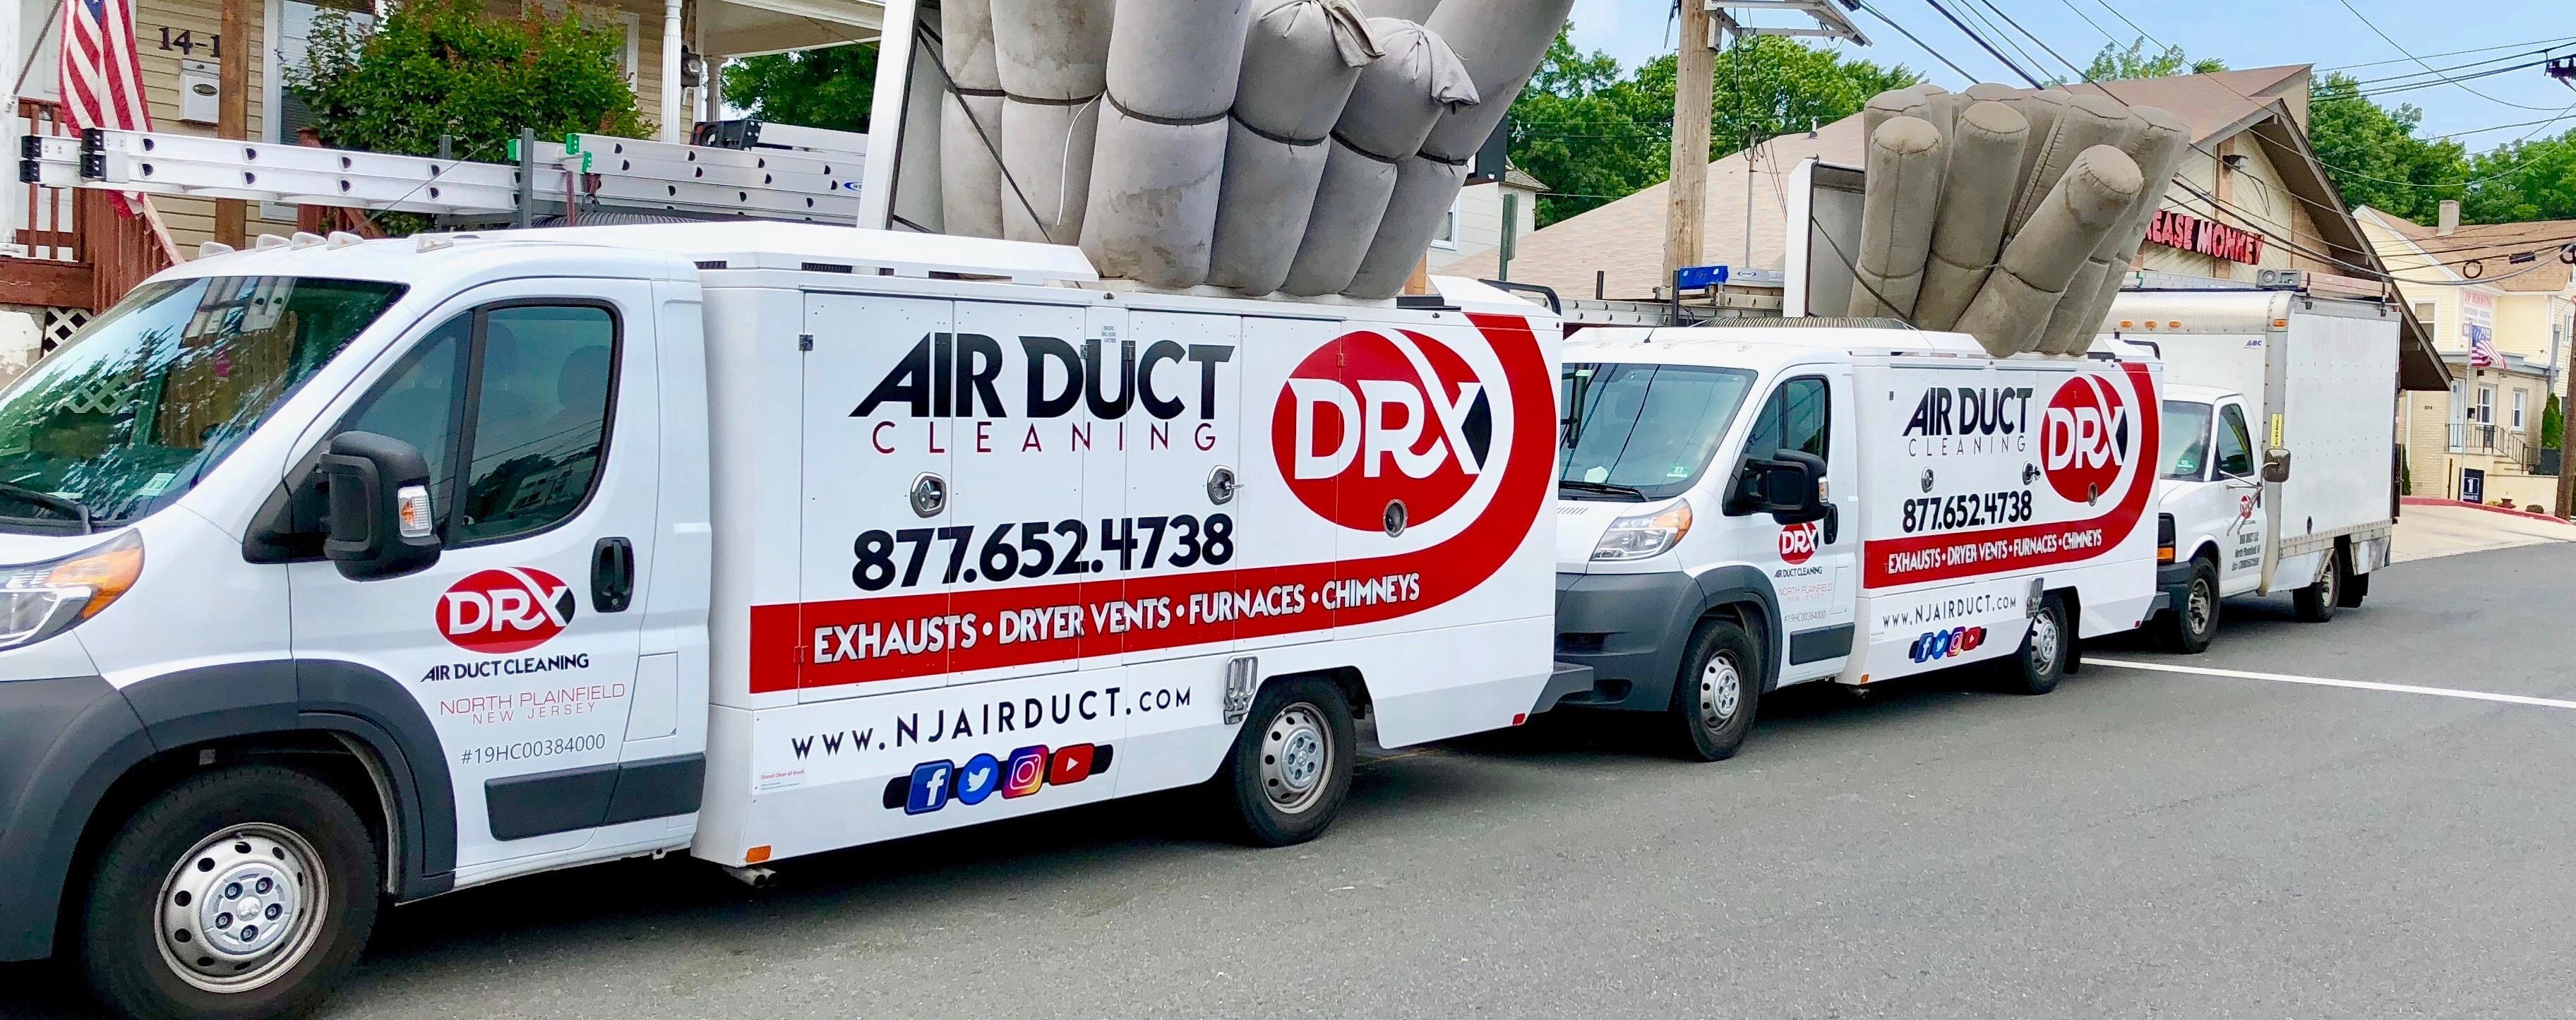 DRX DUCT LLC image 1